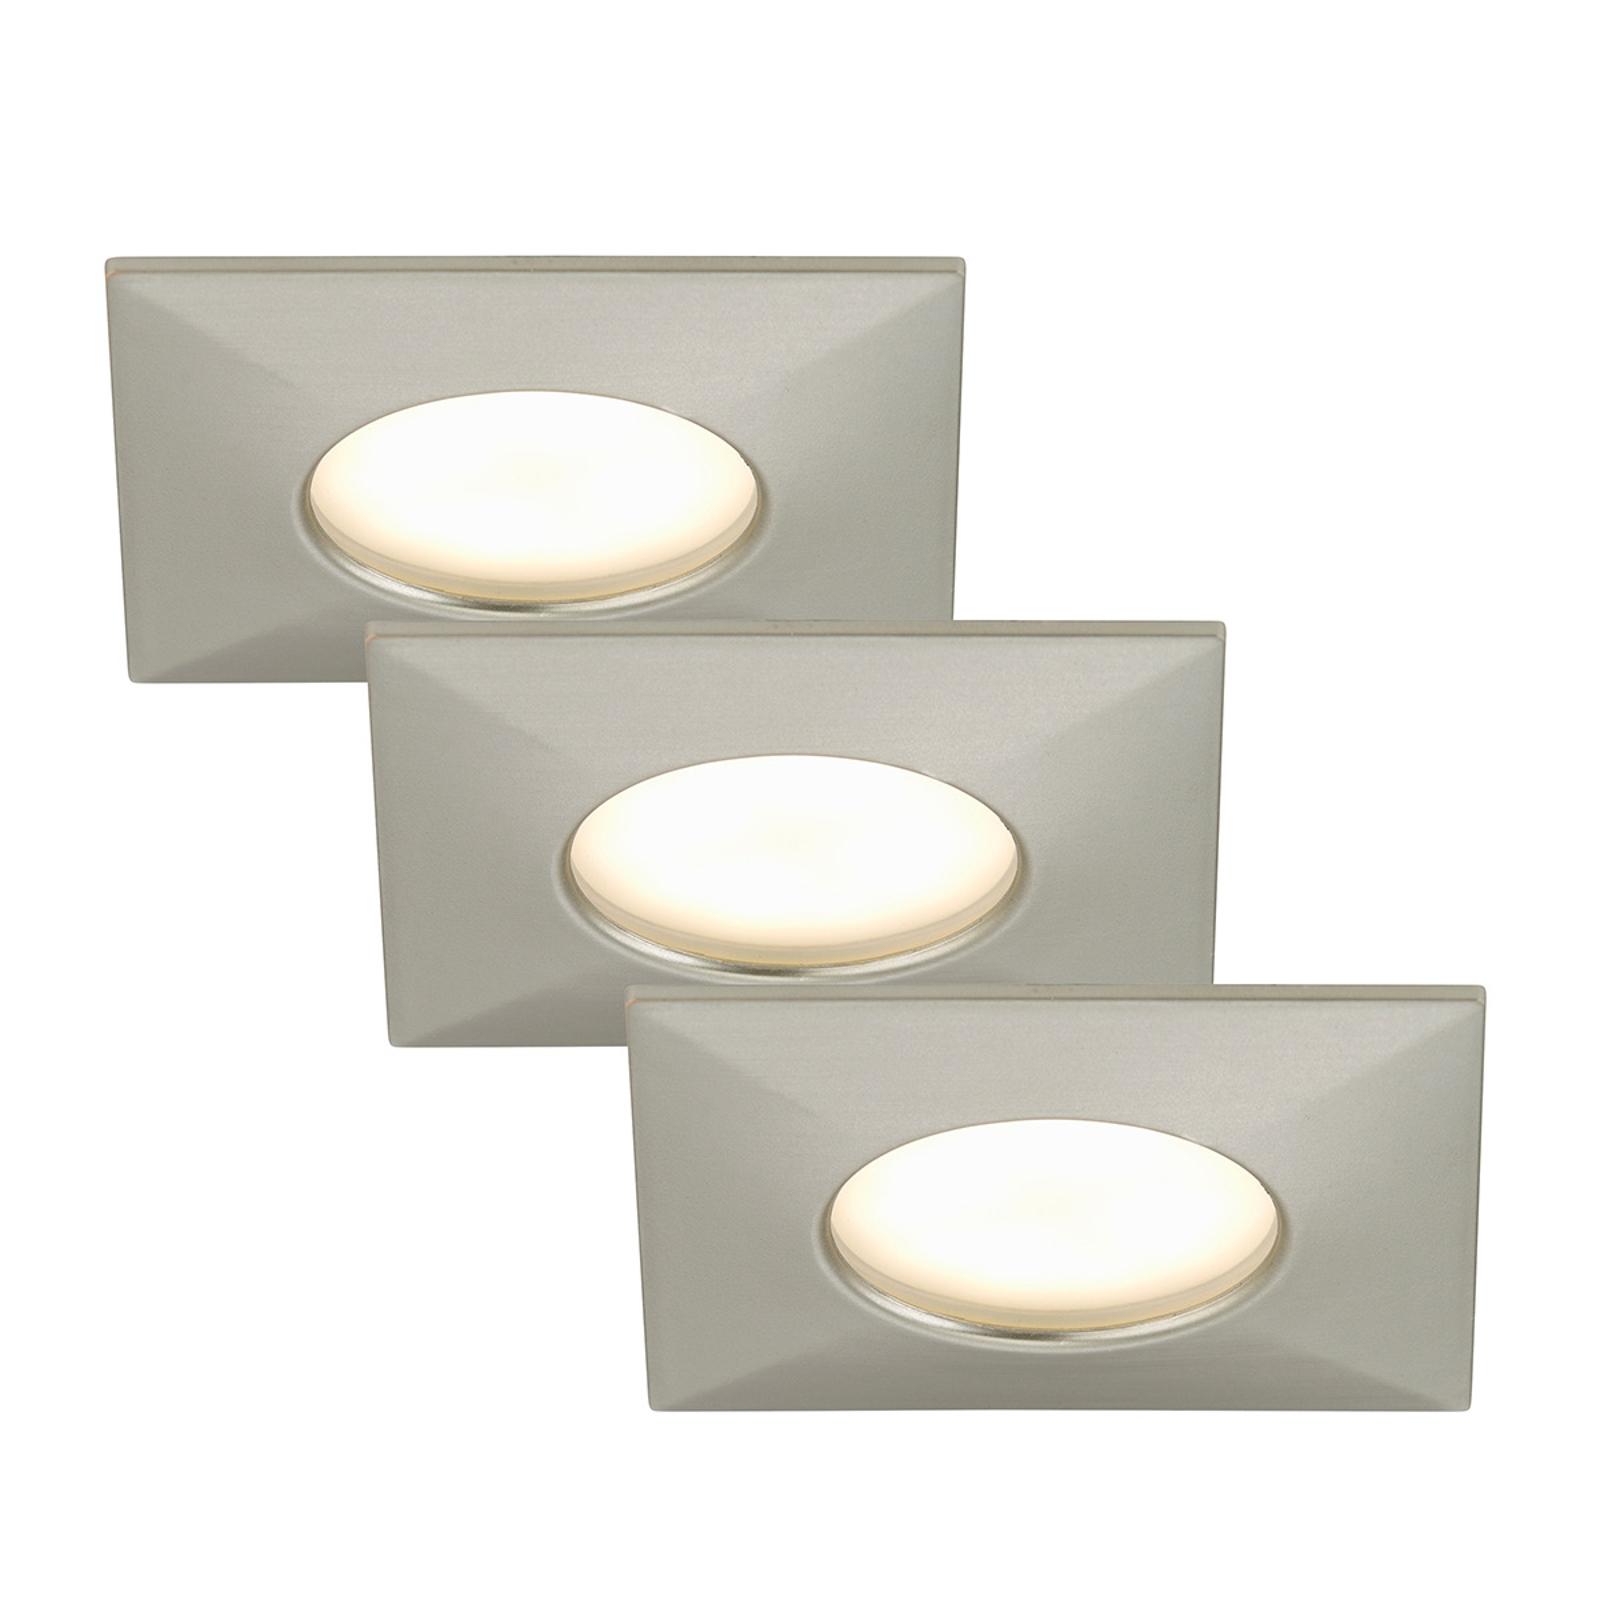 Set de 3 focos empotrables LED Luca, IP44, níquel